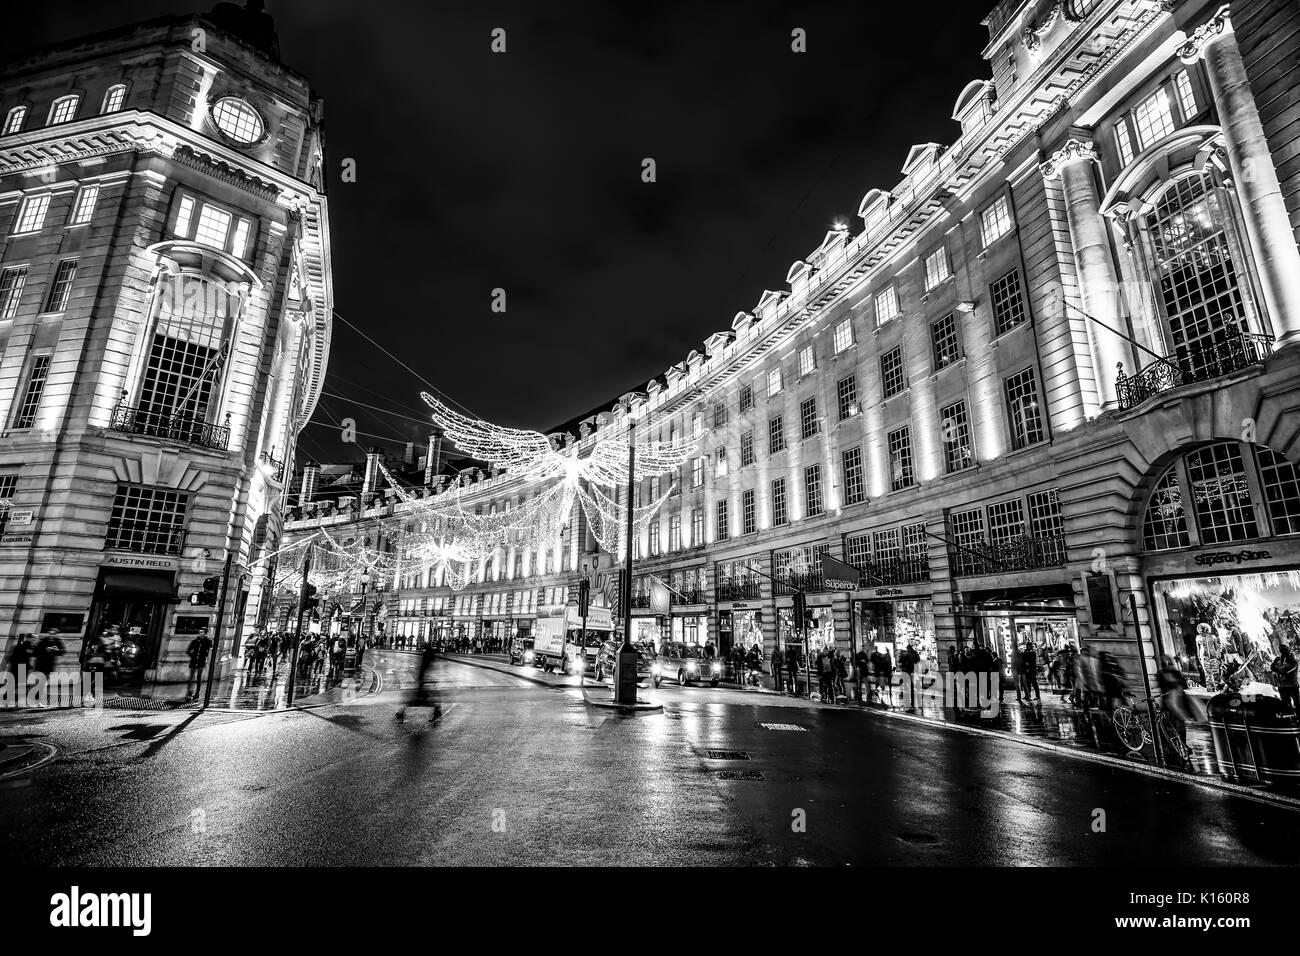 Beautiful Christmas City Lights In London Famous Regent Street Stock Photo Alamy